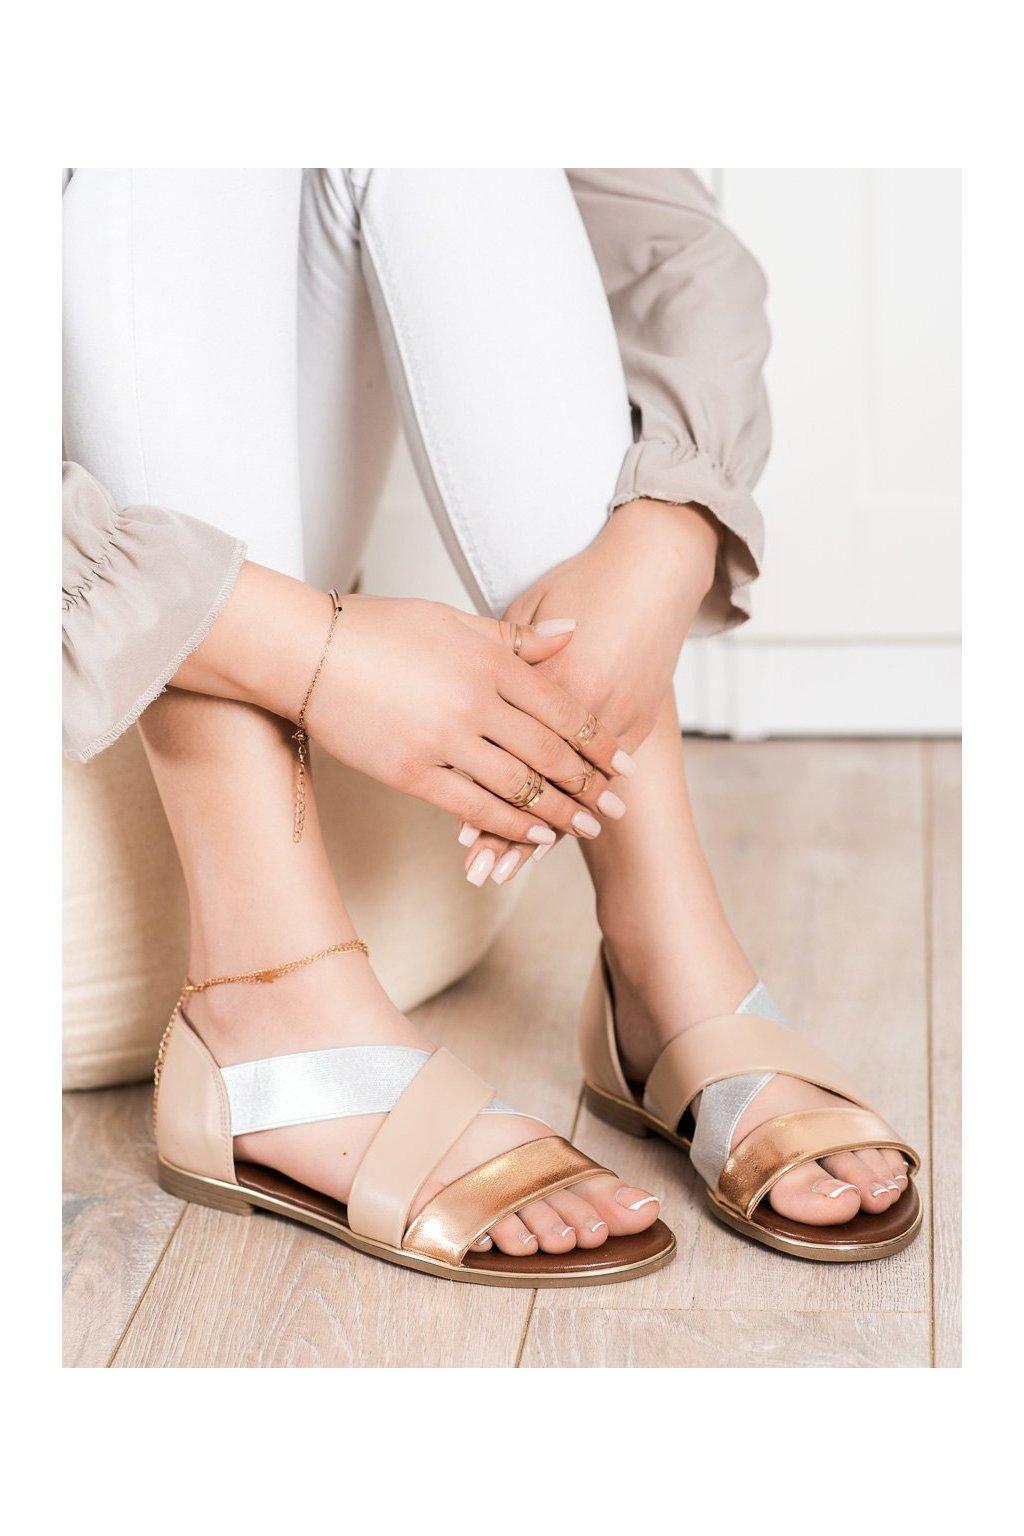 Hnedé sandále Evento kod 21SD35-3882BE